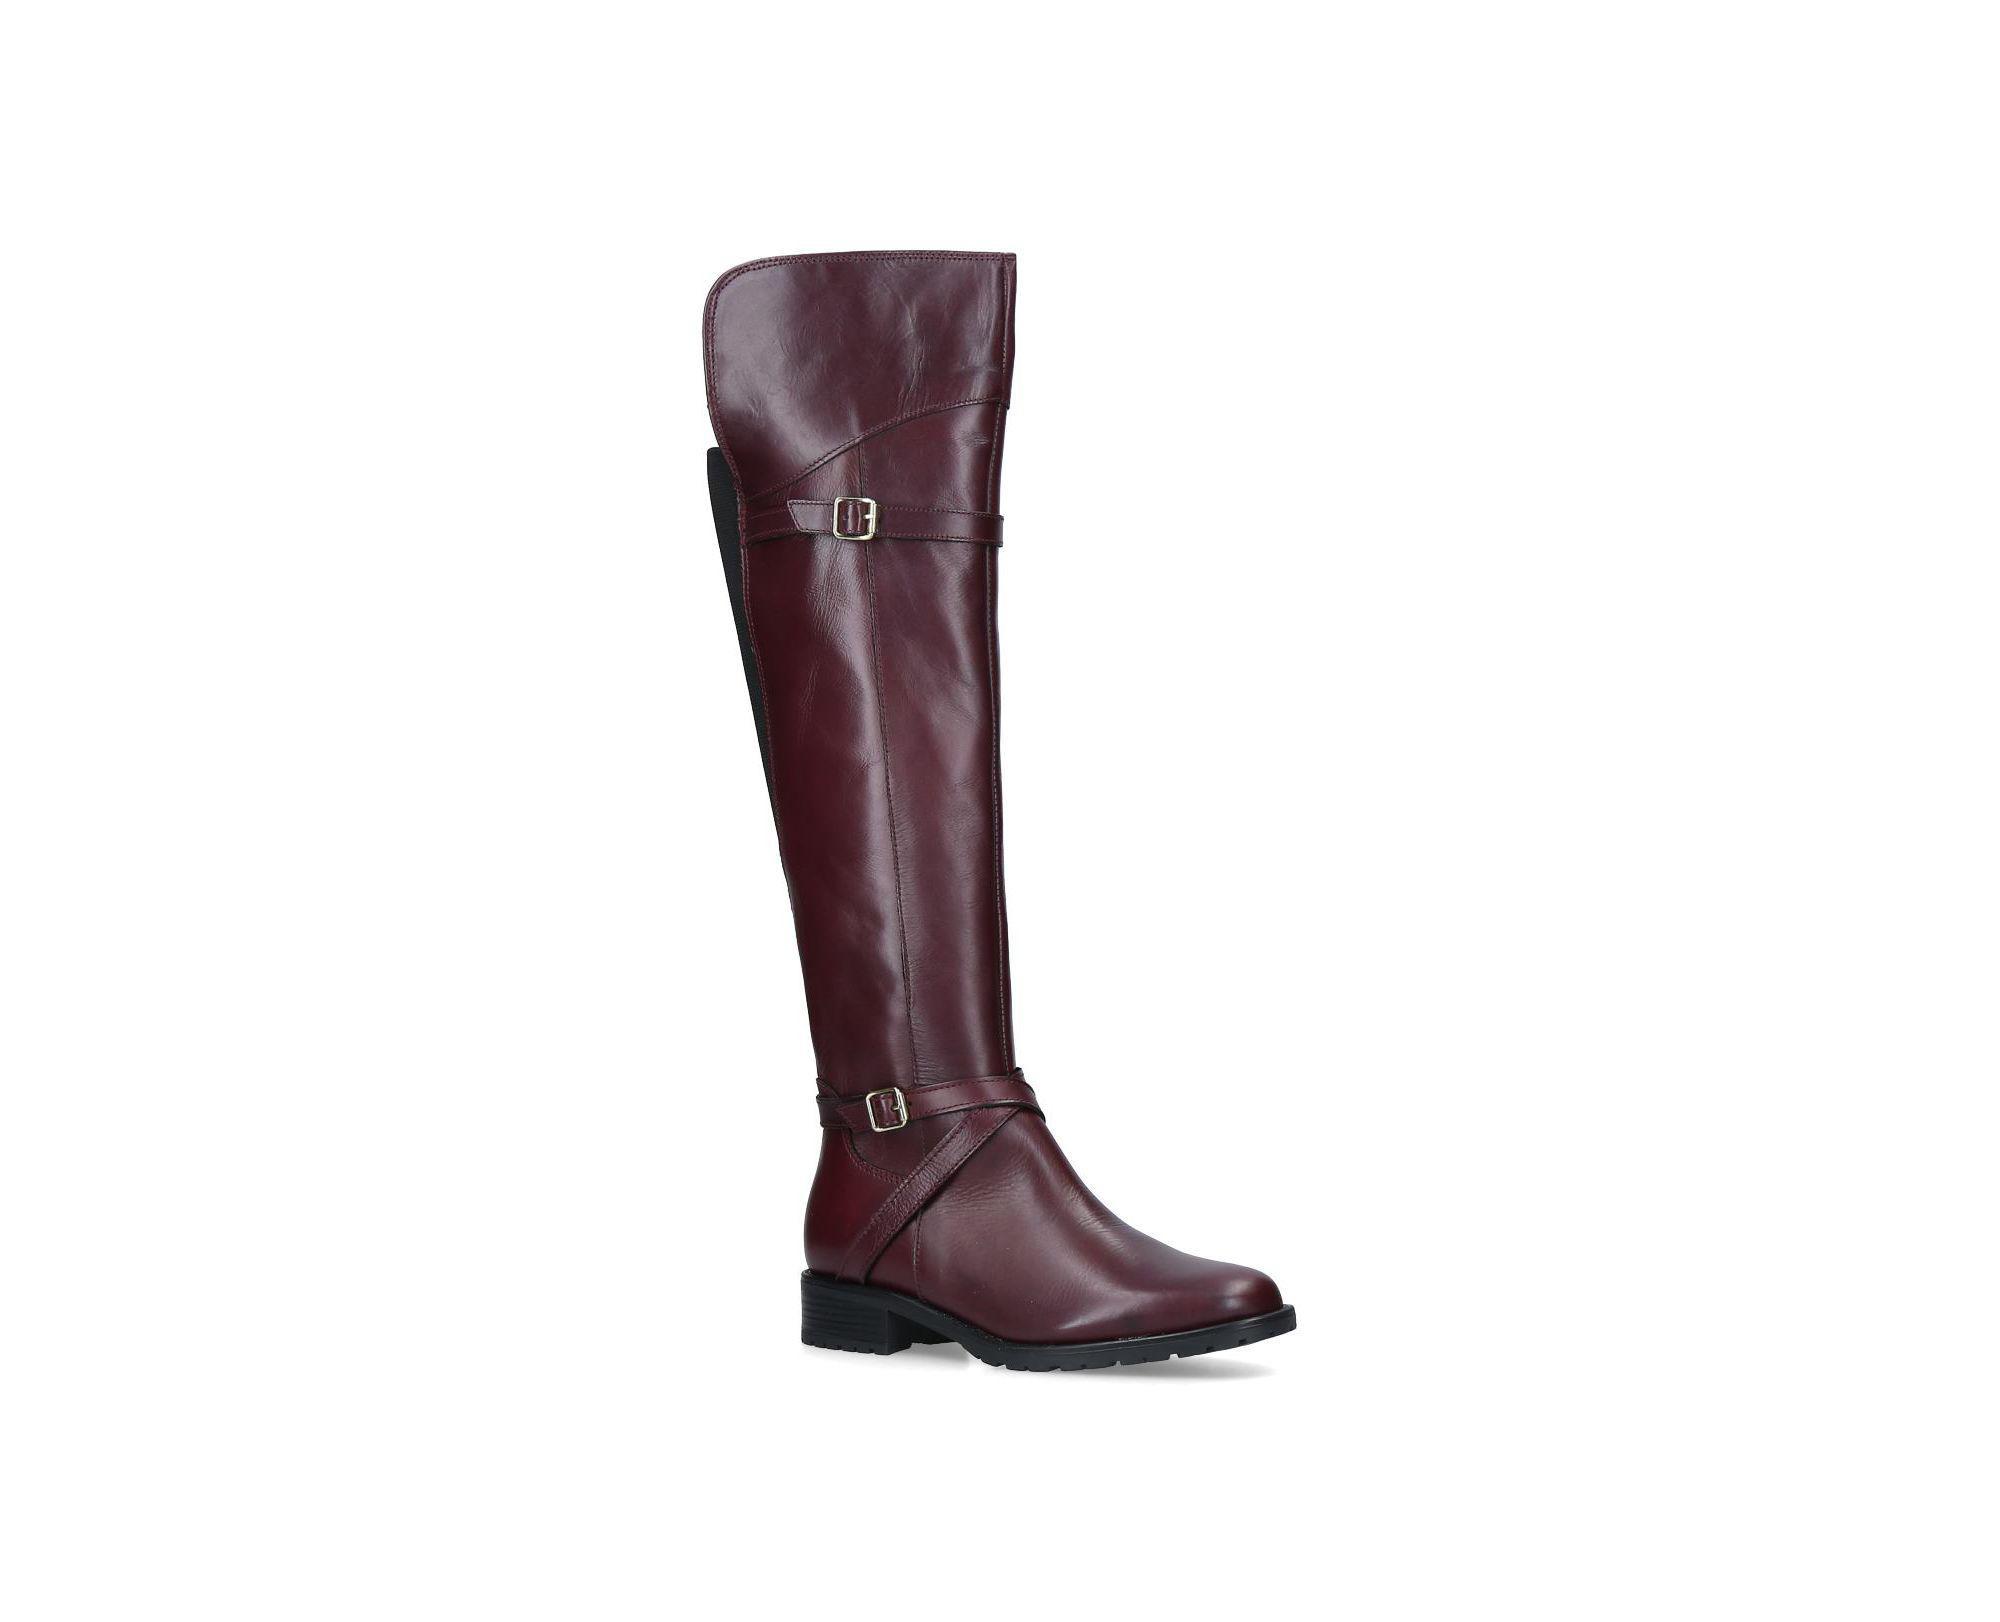 06f1bbf1da3 Carvela Kurt Geiger Wine  viv  Leather High Leg Boots in Red - Save ...